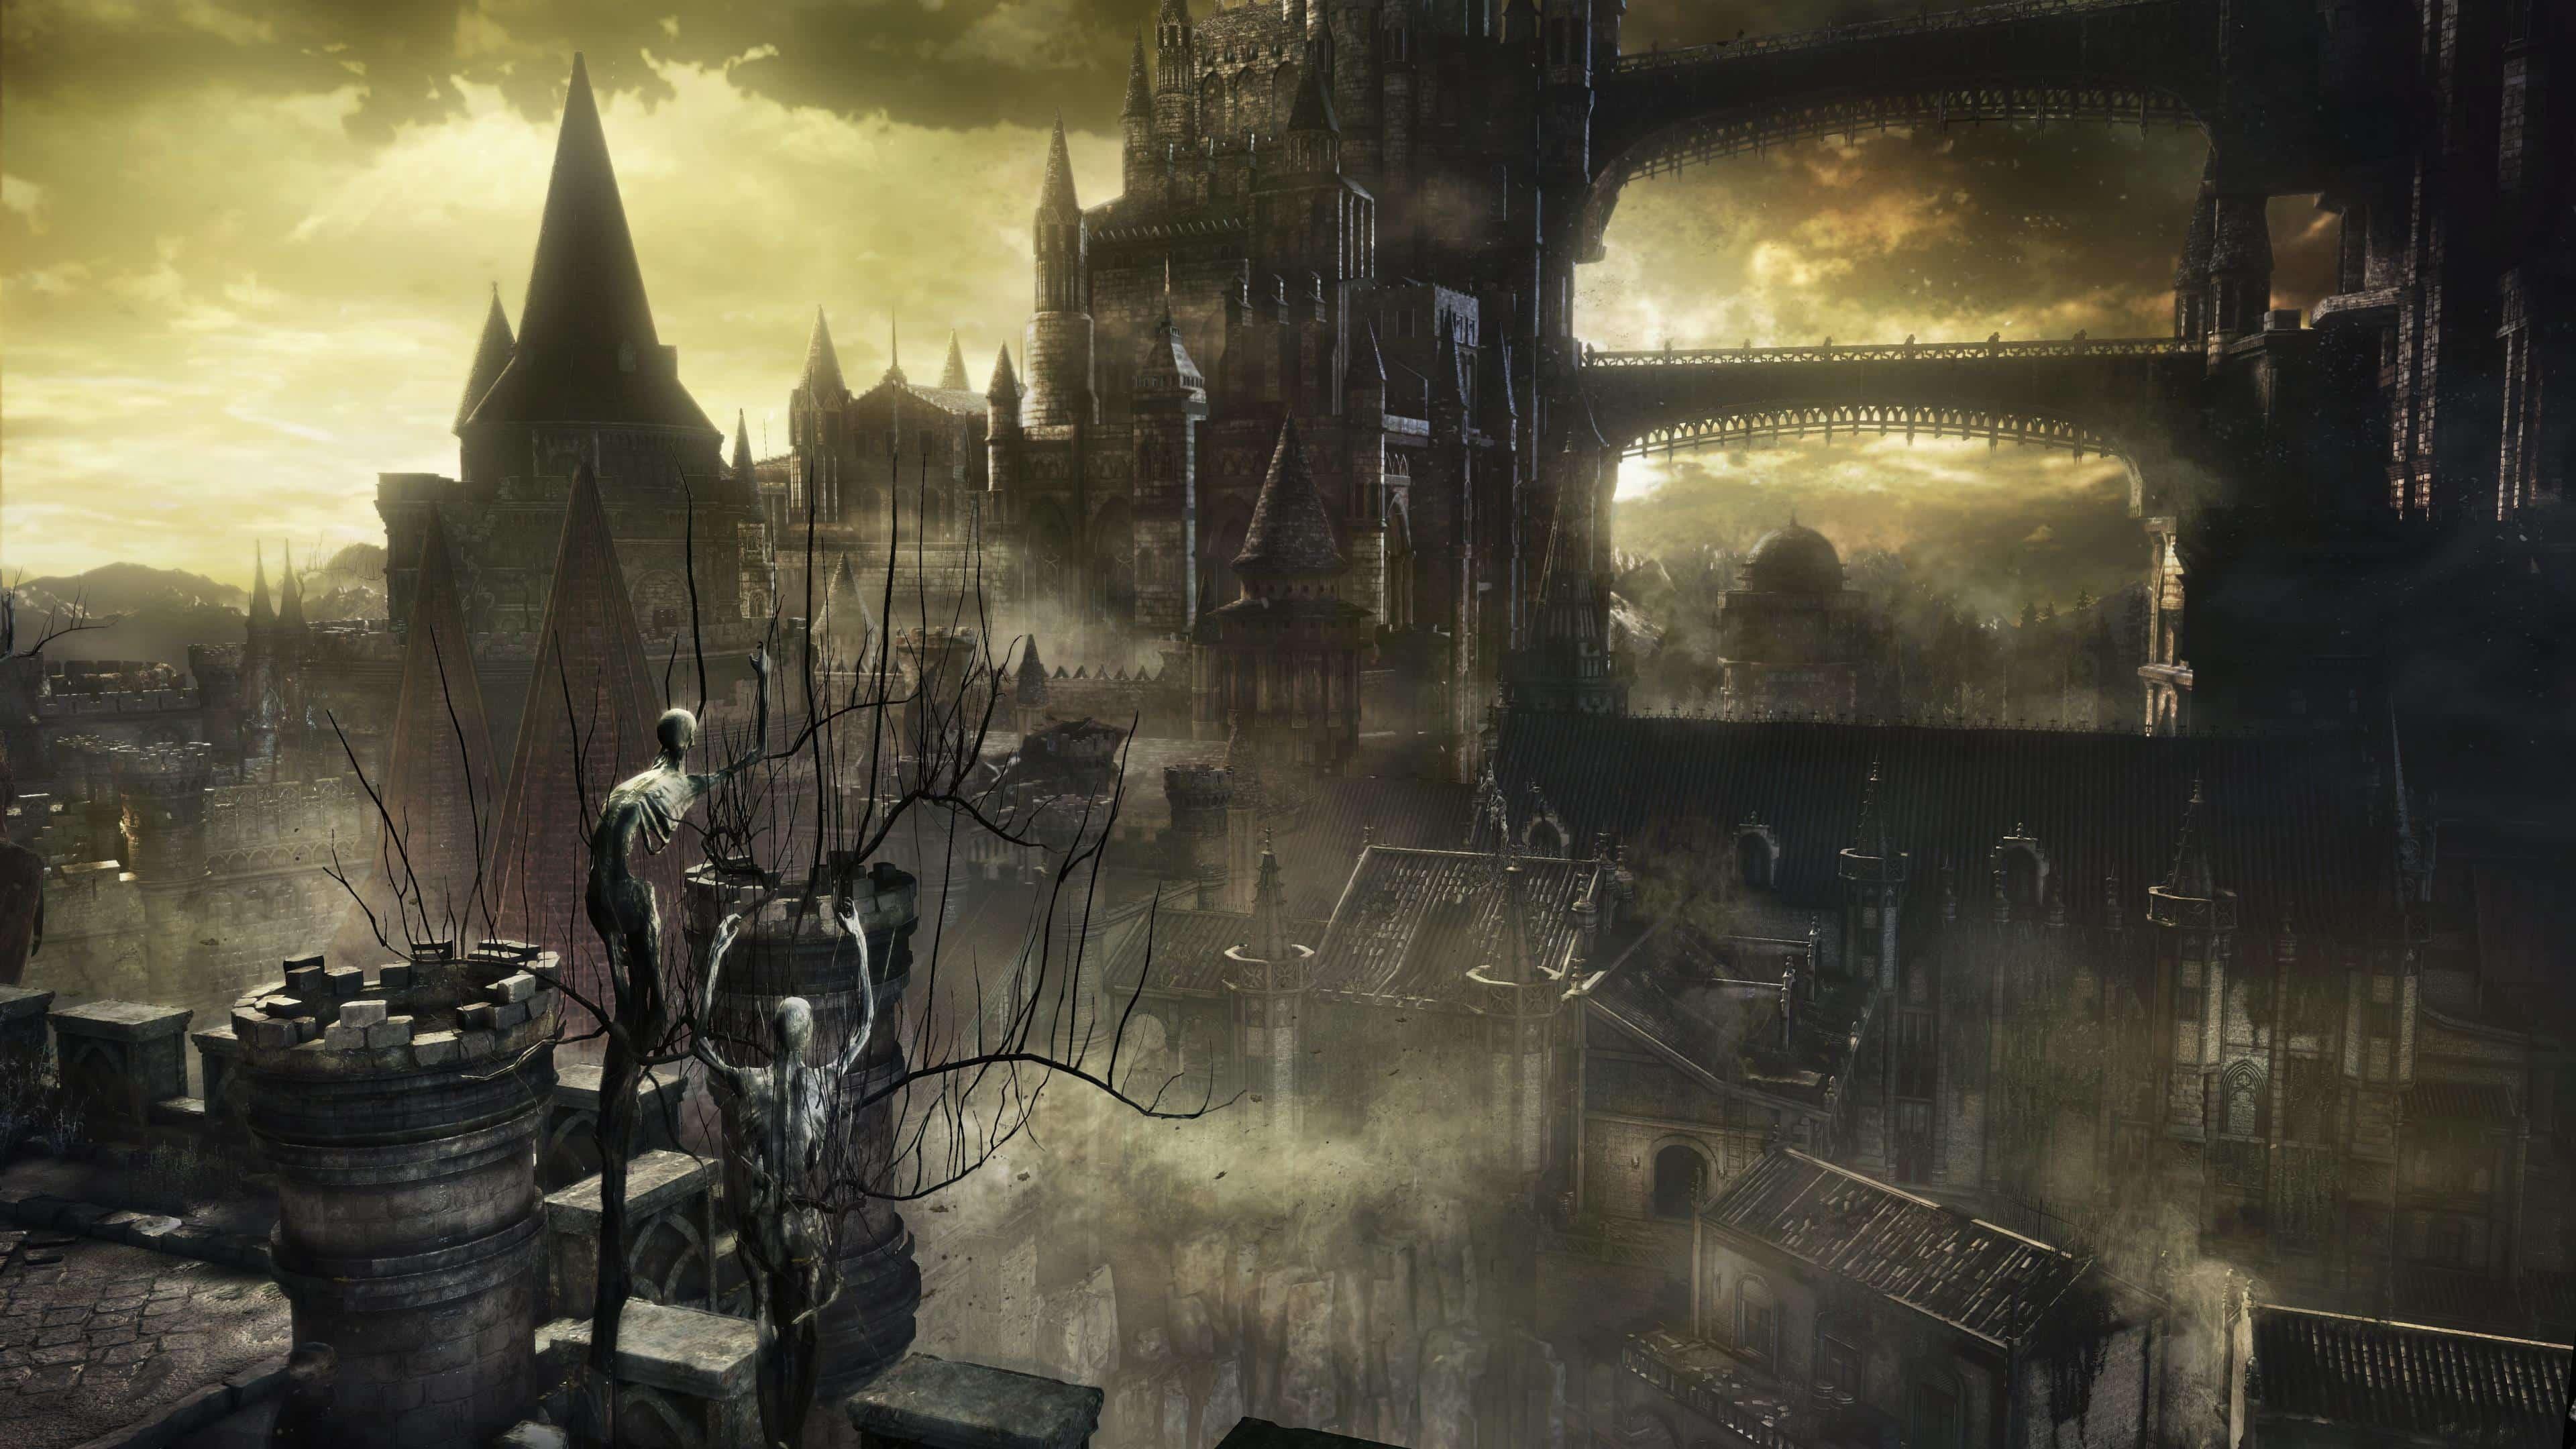 Dark_Souls_3_E3_screenshot_11